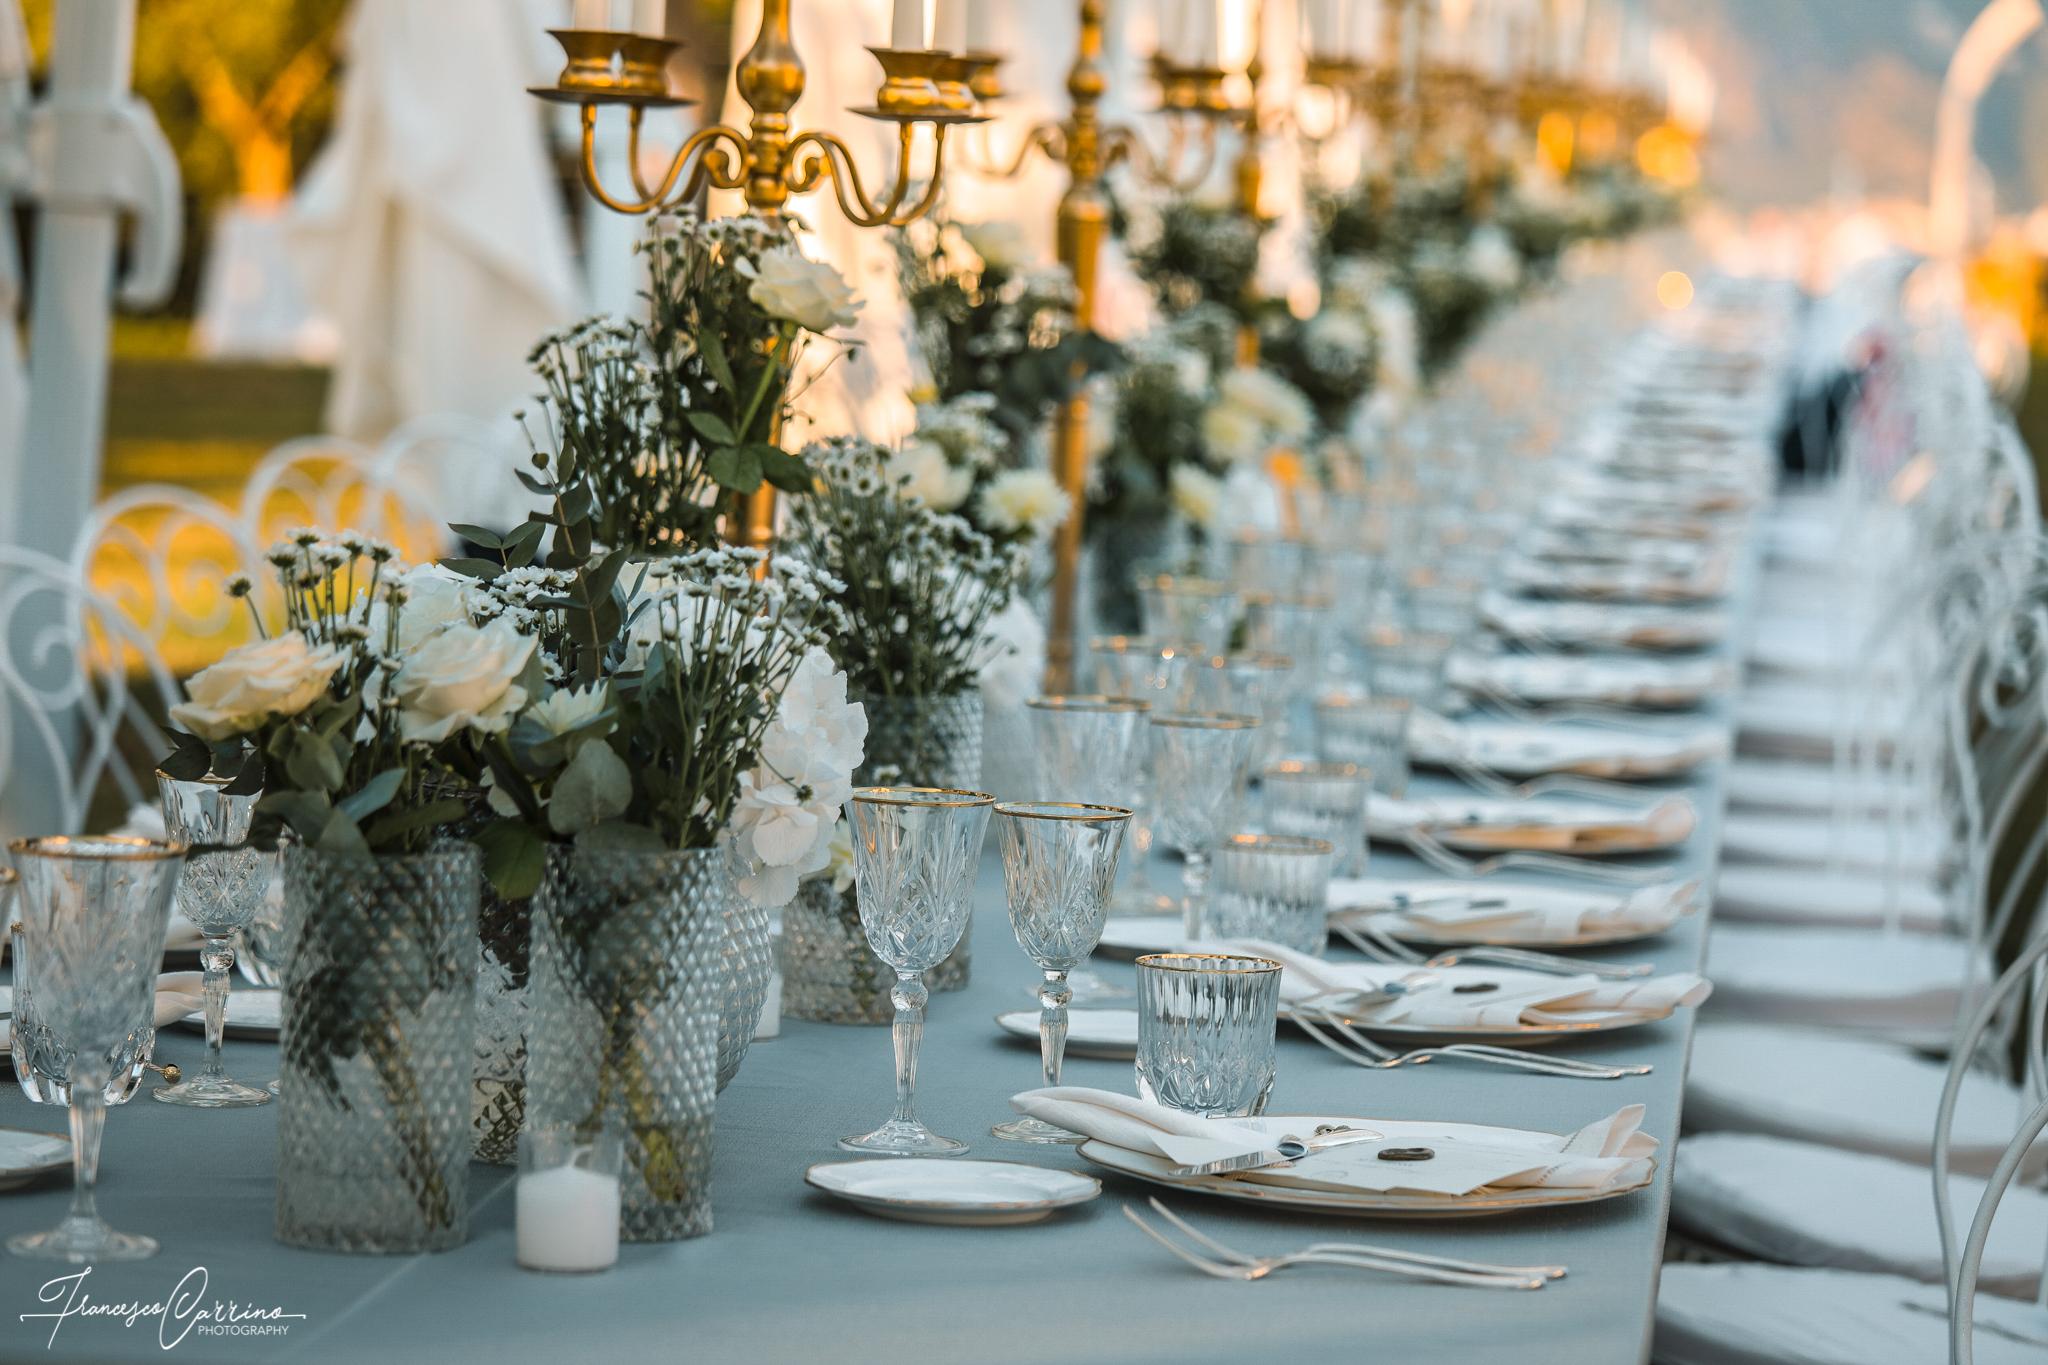 https://www.weddingamalfi.com/wp-content/uploads/Giannenza-13-luglio-2019-13.jpg